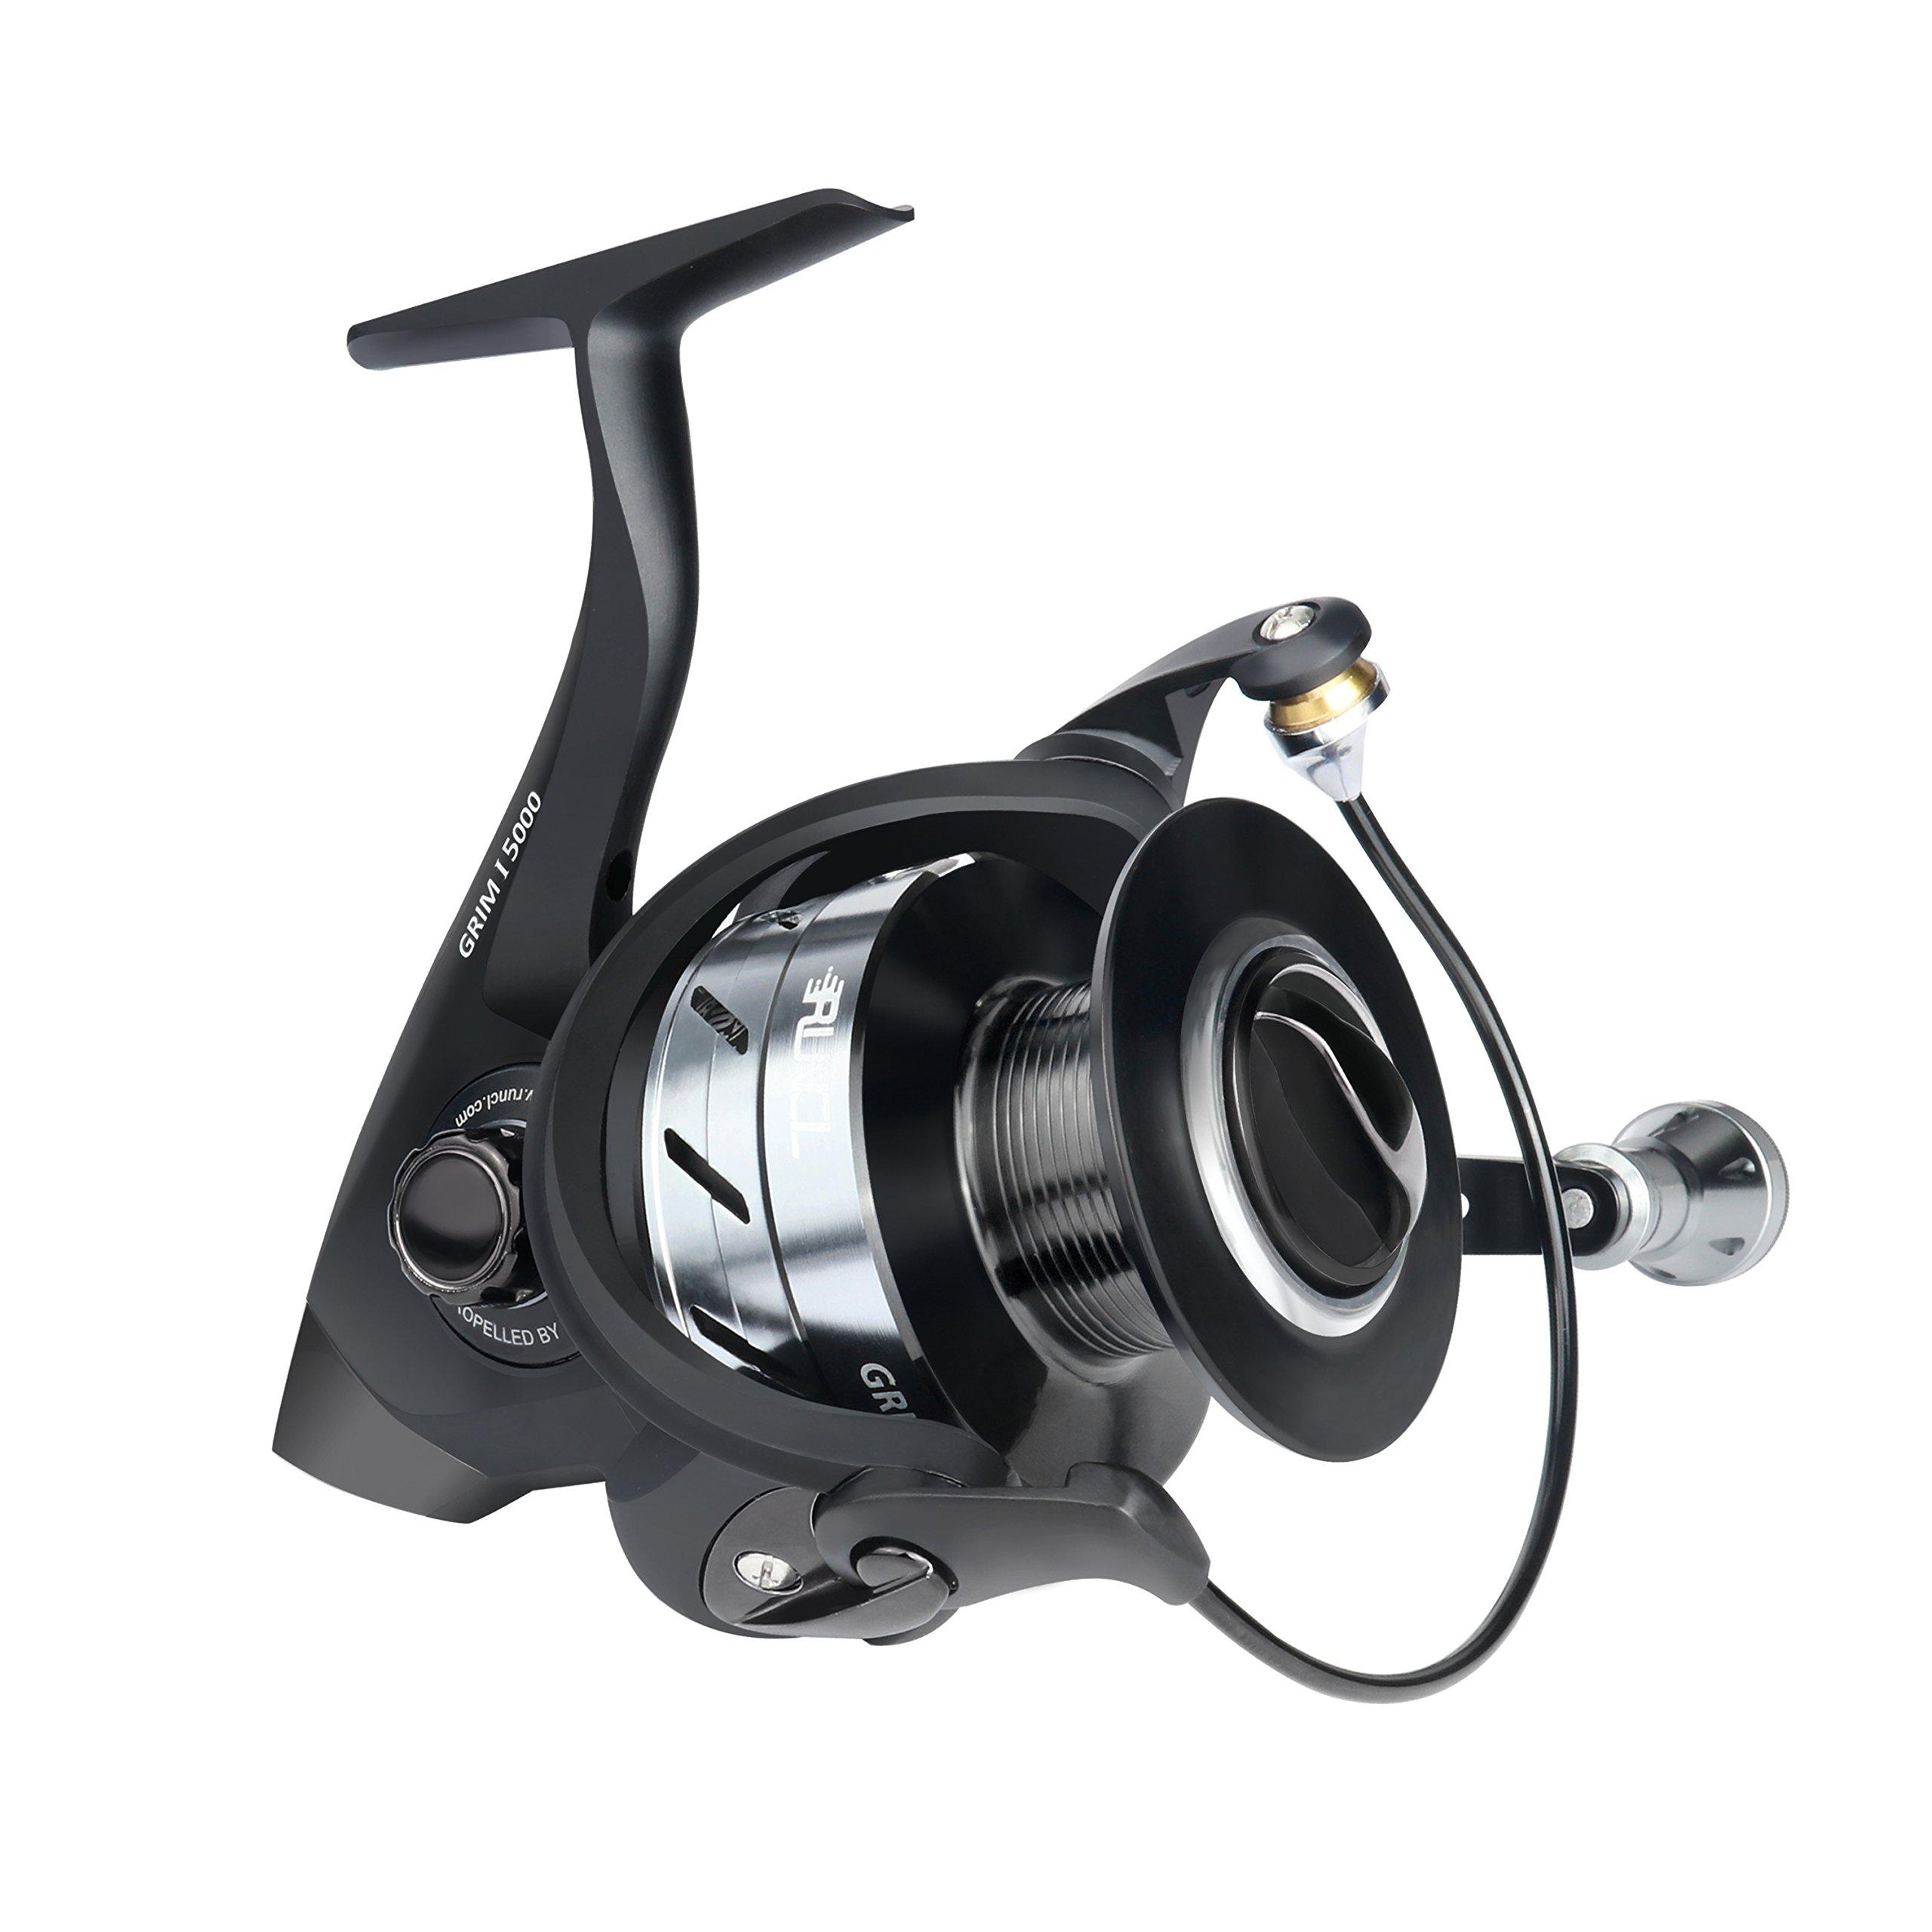 1 Lineaeffe Vigor SX 30 Front drag spinning Fishing Reel